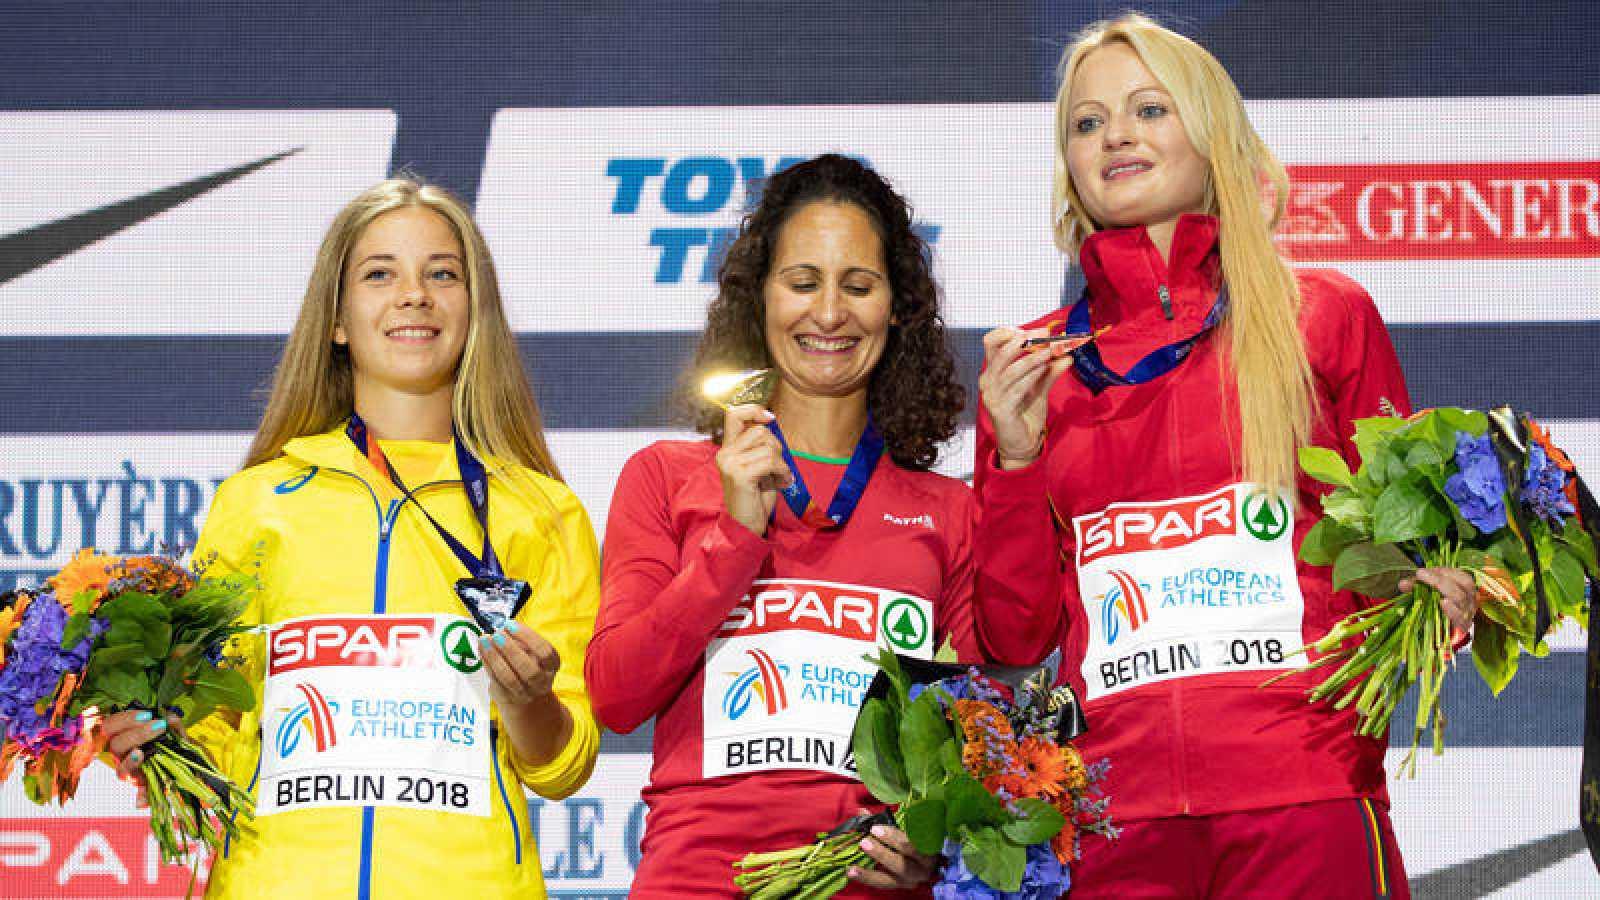 Alina Tsvily, rival de Julia Takacs en el podio de Berlín da positivo por dopaje